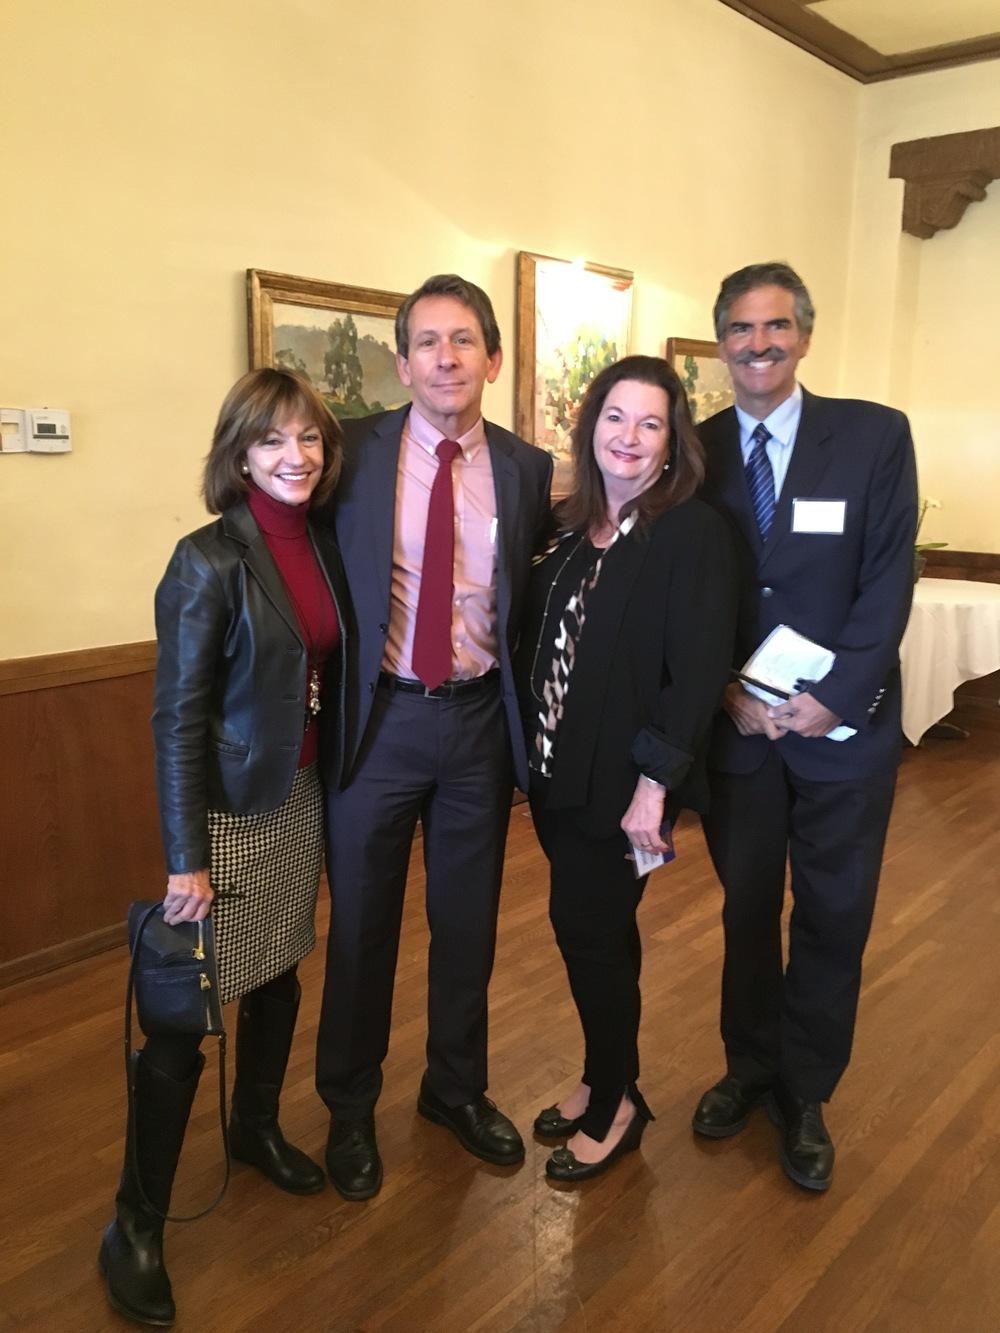 From left to right: Judy Rattray, First American Title; Mark Schniepp, Presenter; Jennifer Goddard Combs, Moderator; and John Palmenteri, TV/News Reporter.